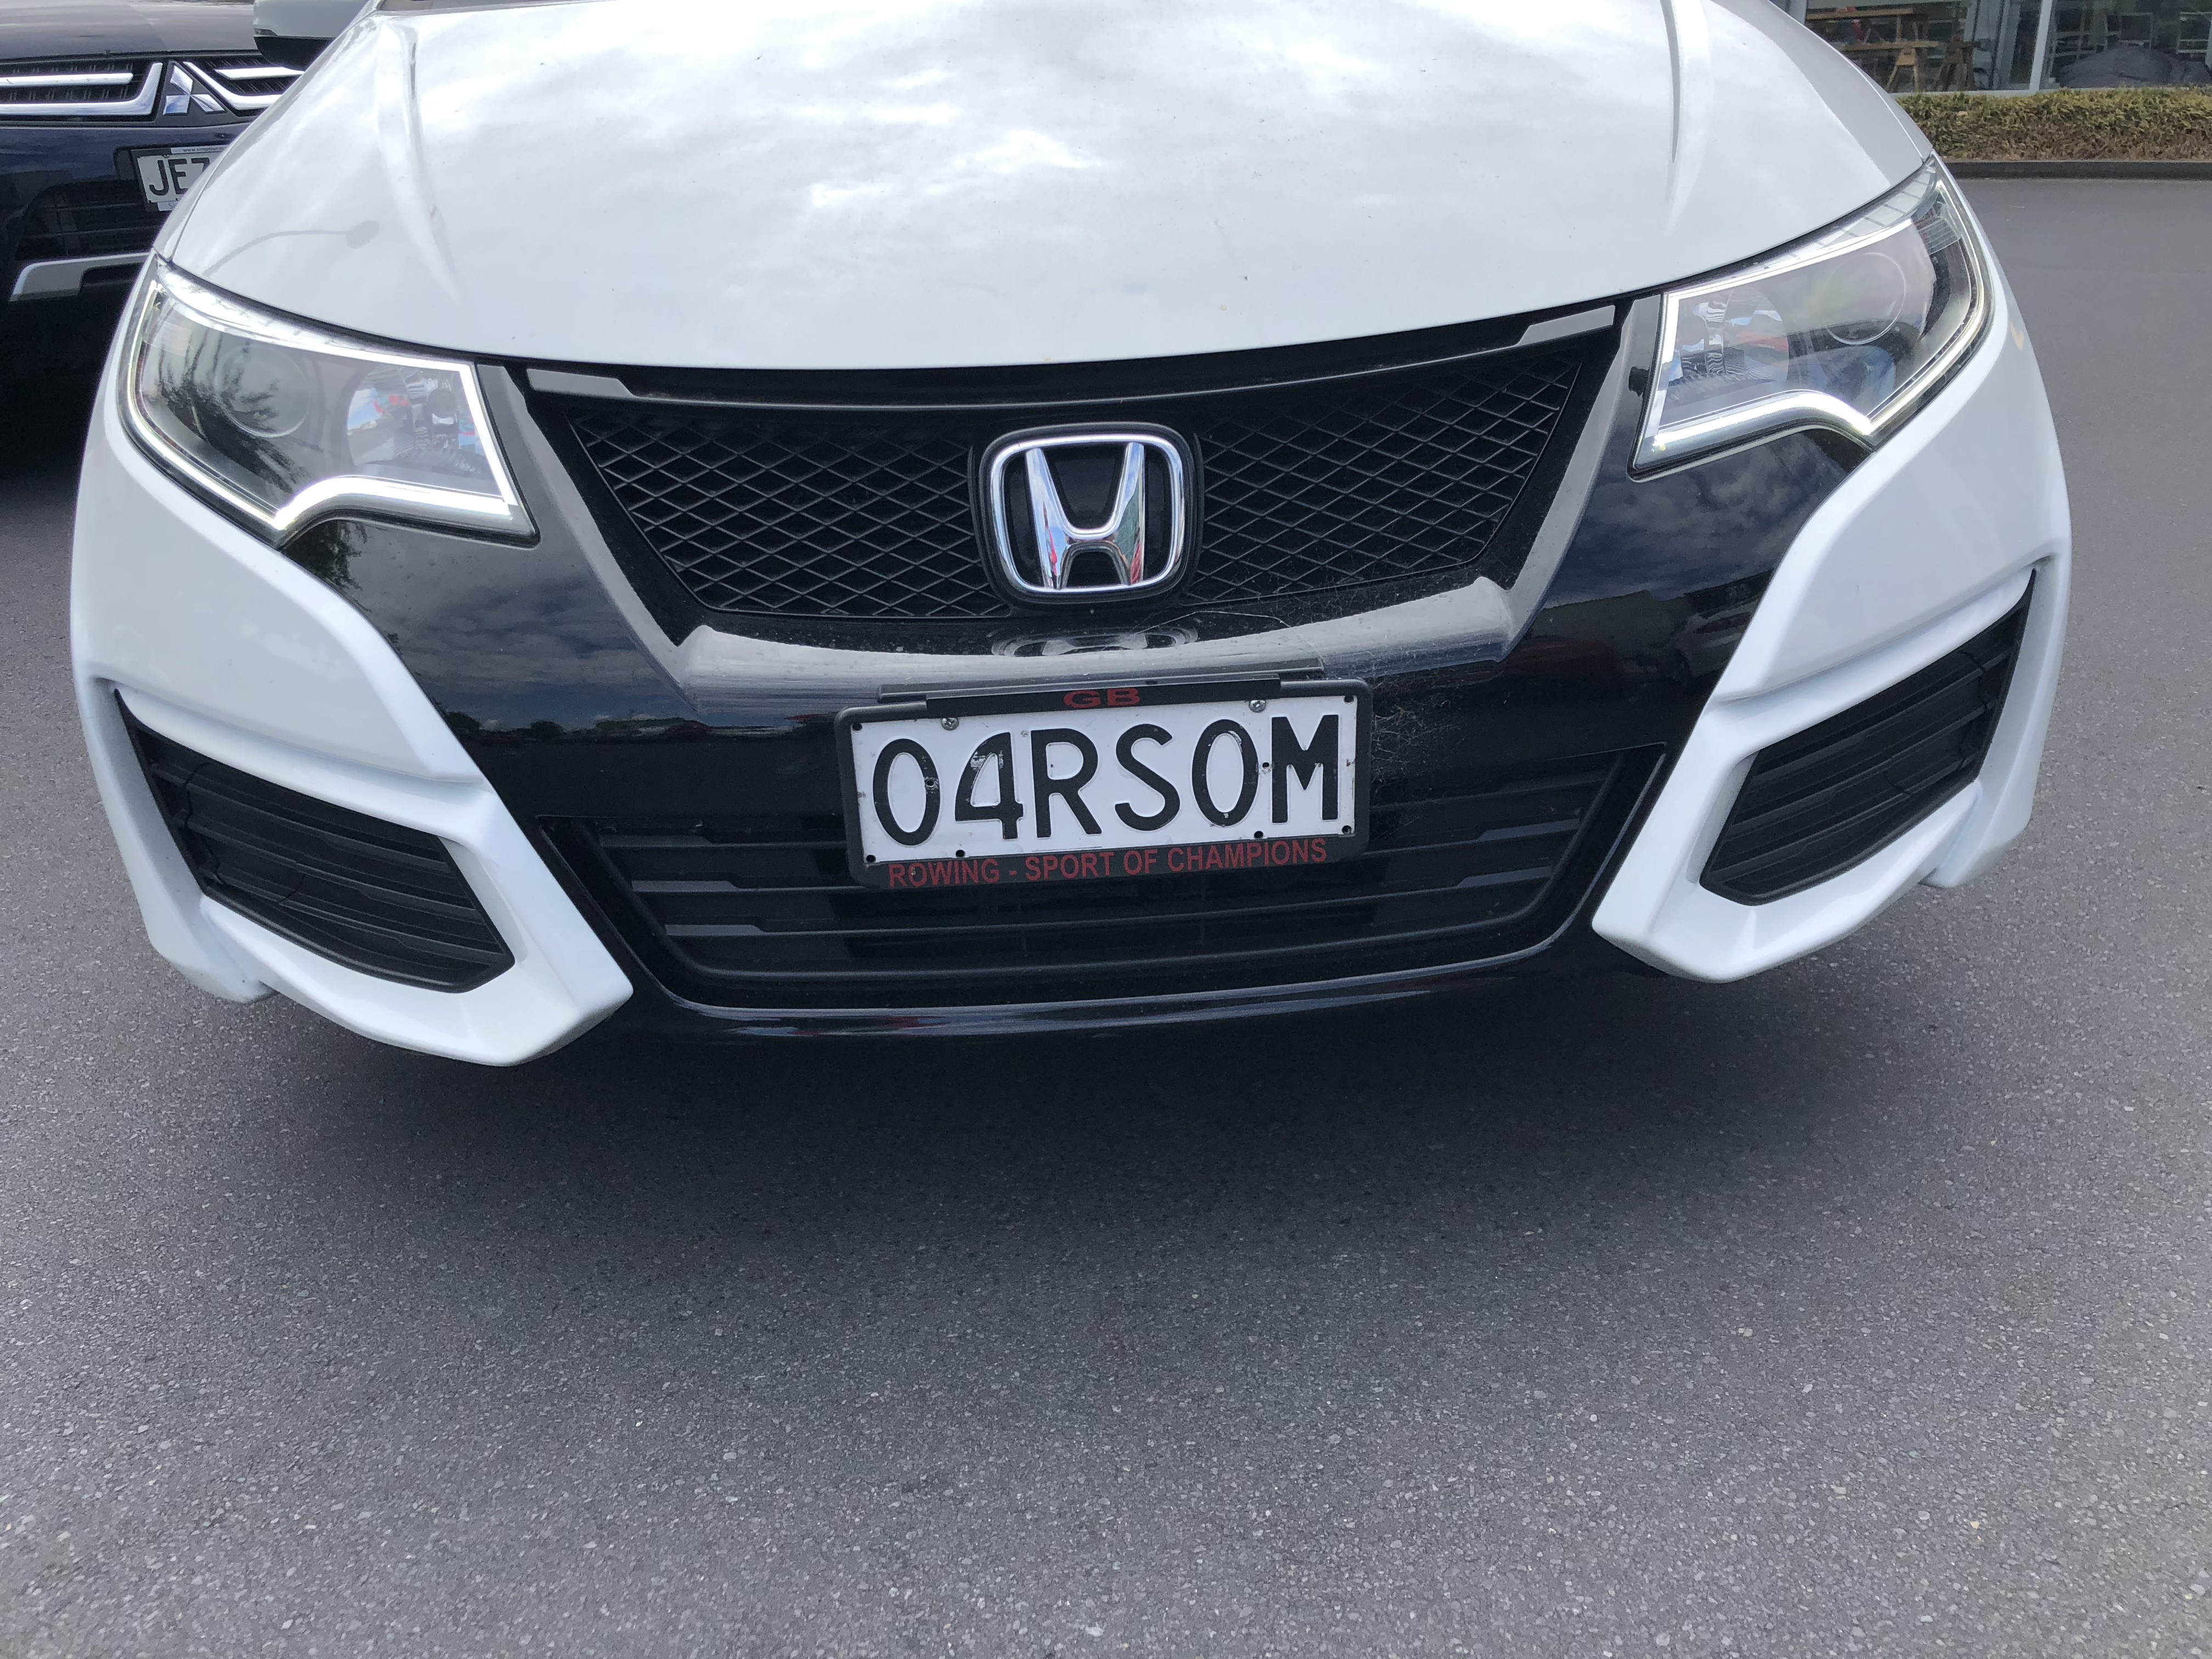 Oarsom car license plate